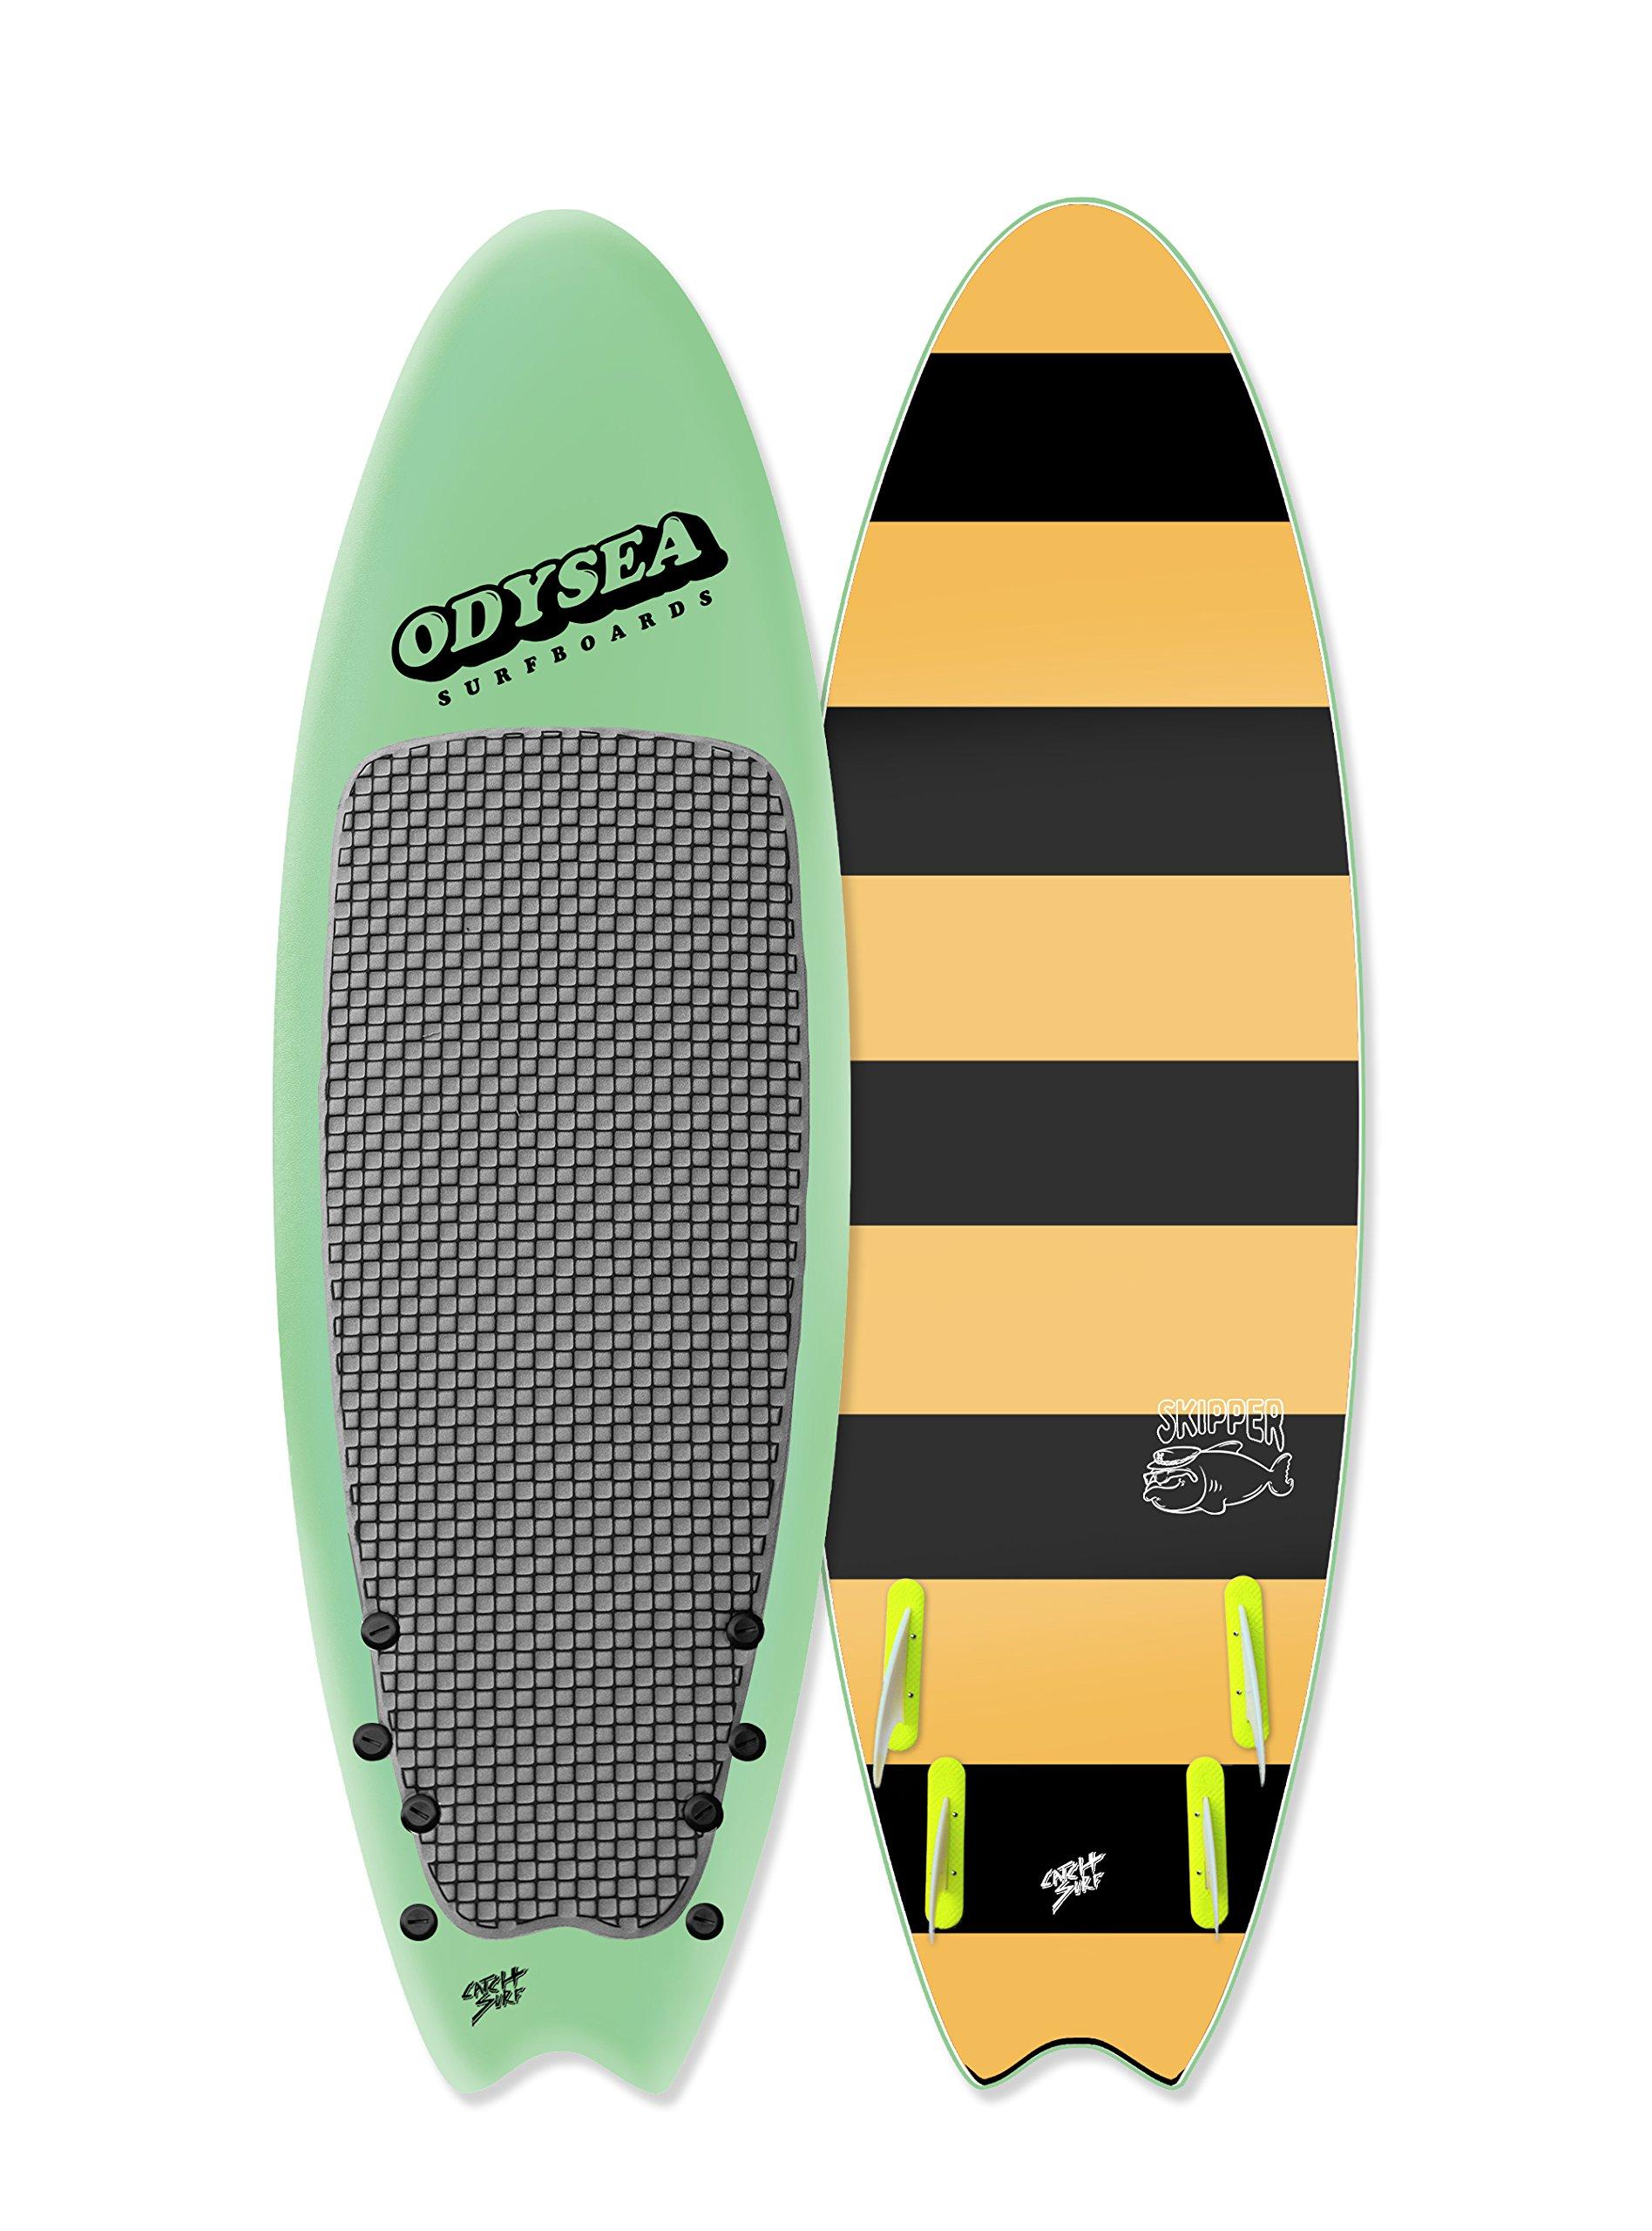 Catch Surf WKSODY60MT17 Wake Surfer-Odysea 6'0